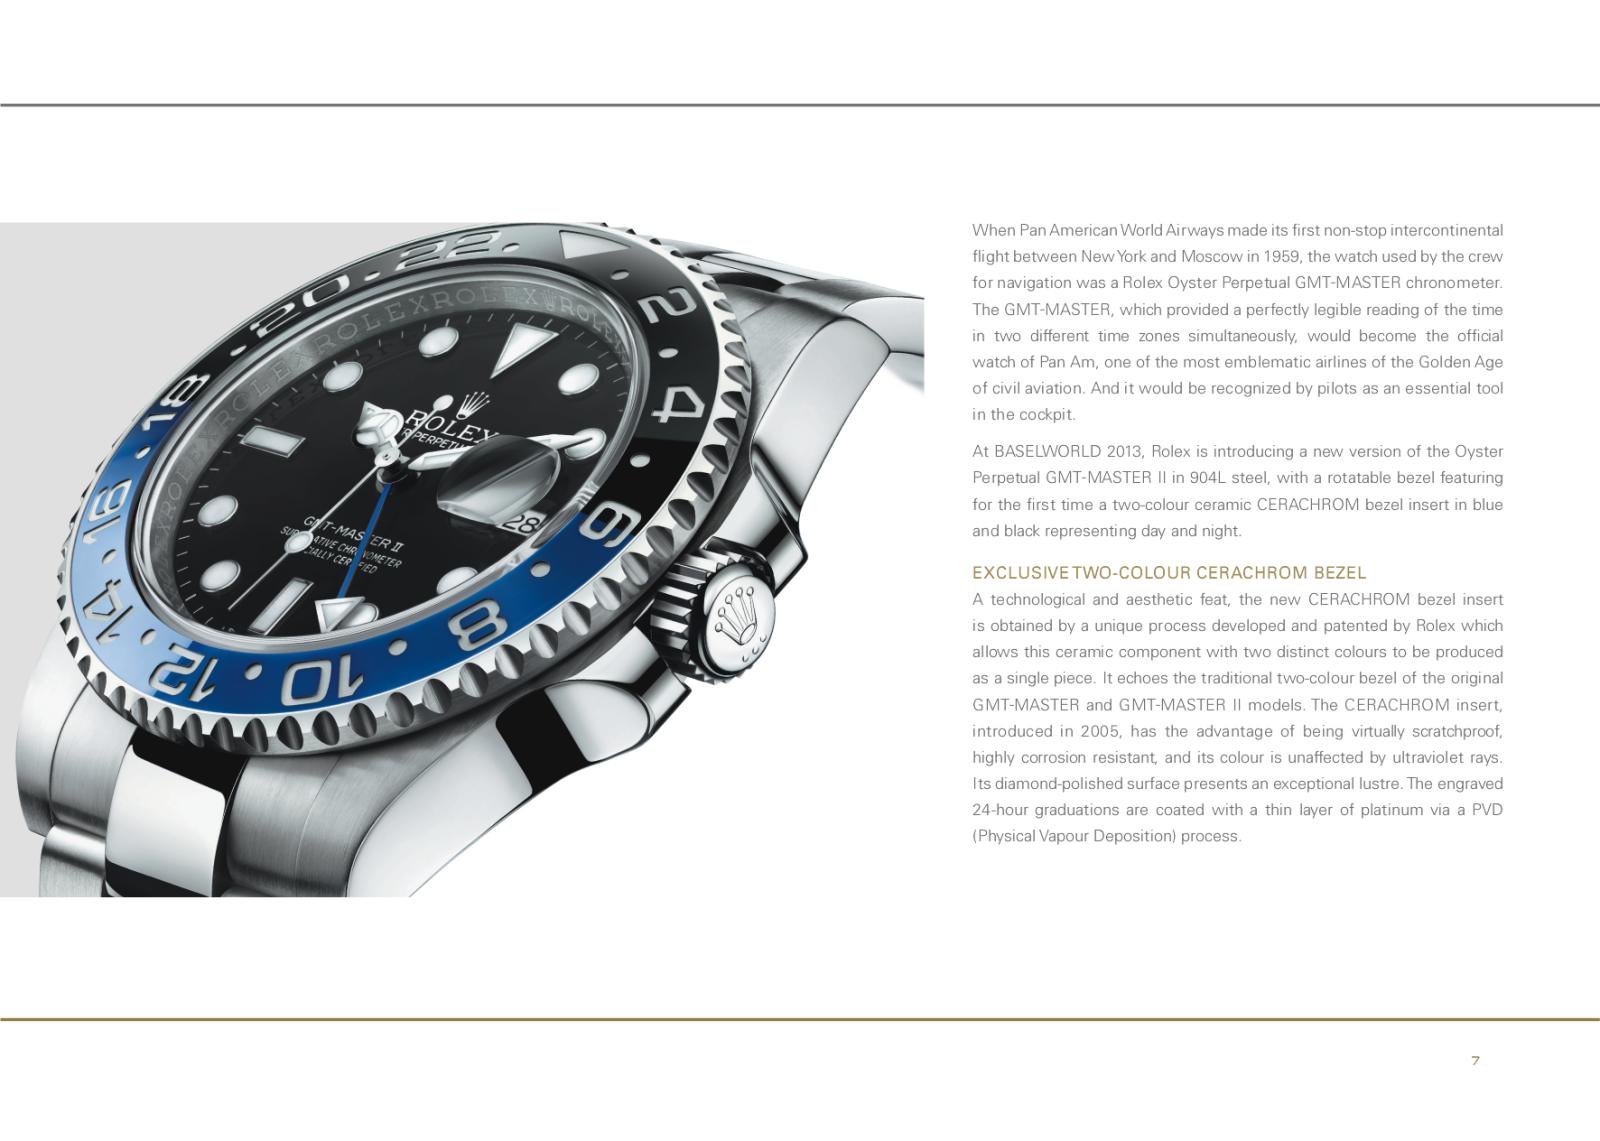 Baselworld 2013: Rolex 2d6mtj9